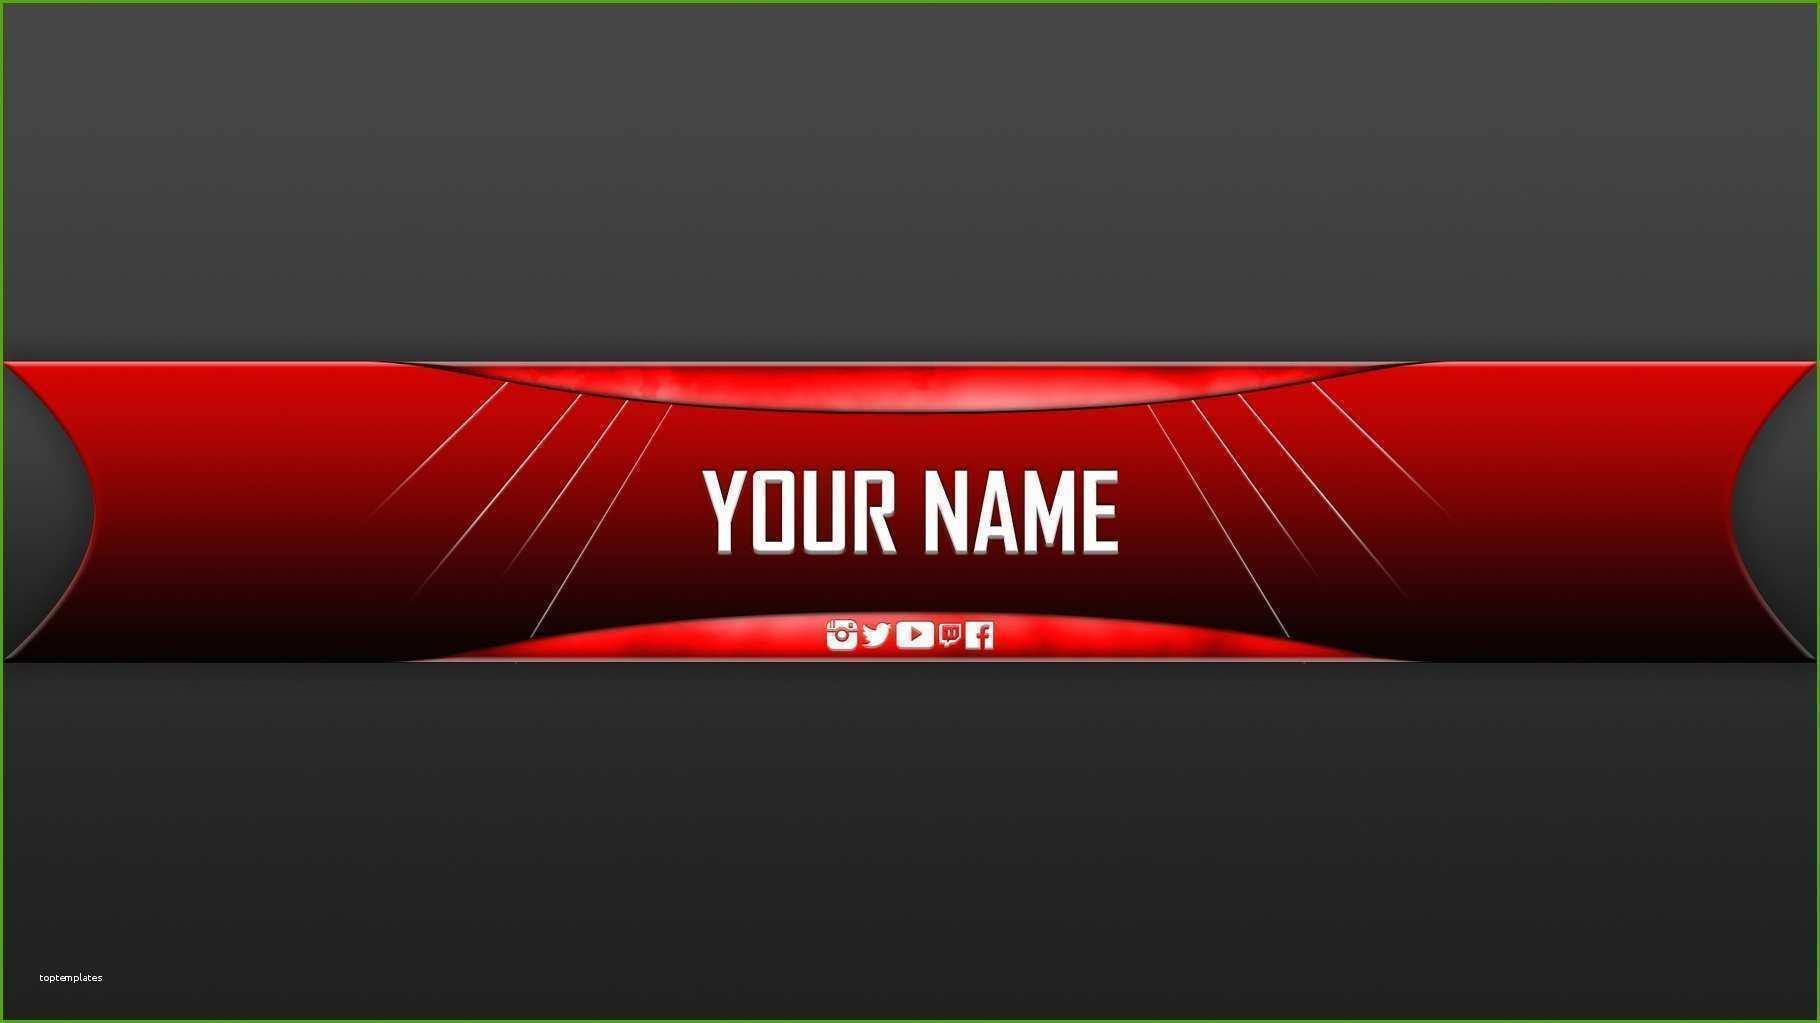 Youtube Kanalbanner Vorlage Gute Youtube Gaming Banner Template Banner Ideen Banner Youtube Banner Vorlage